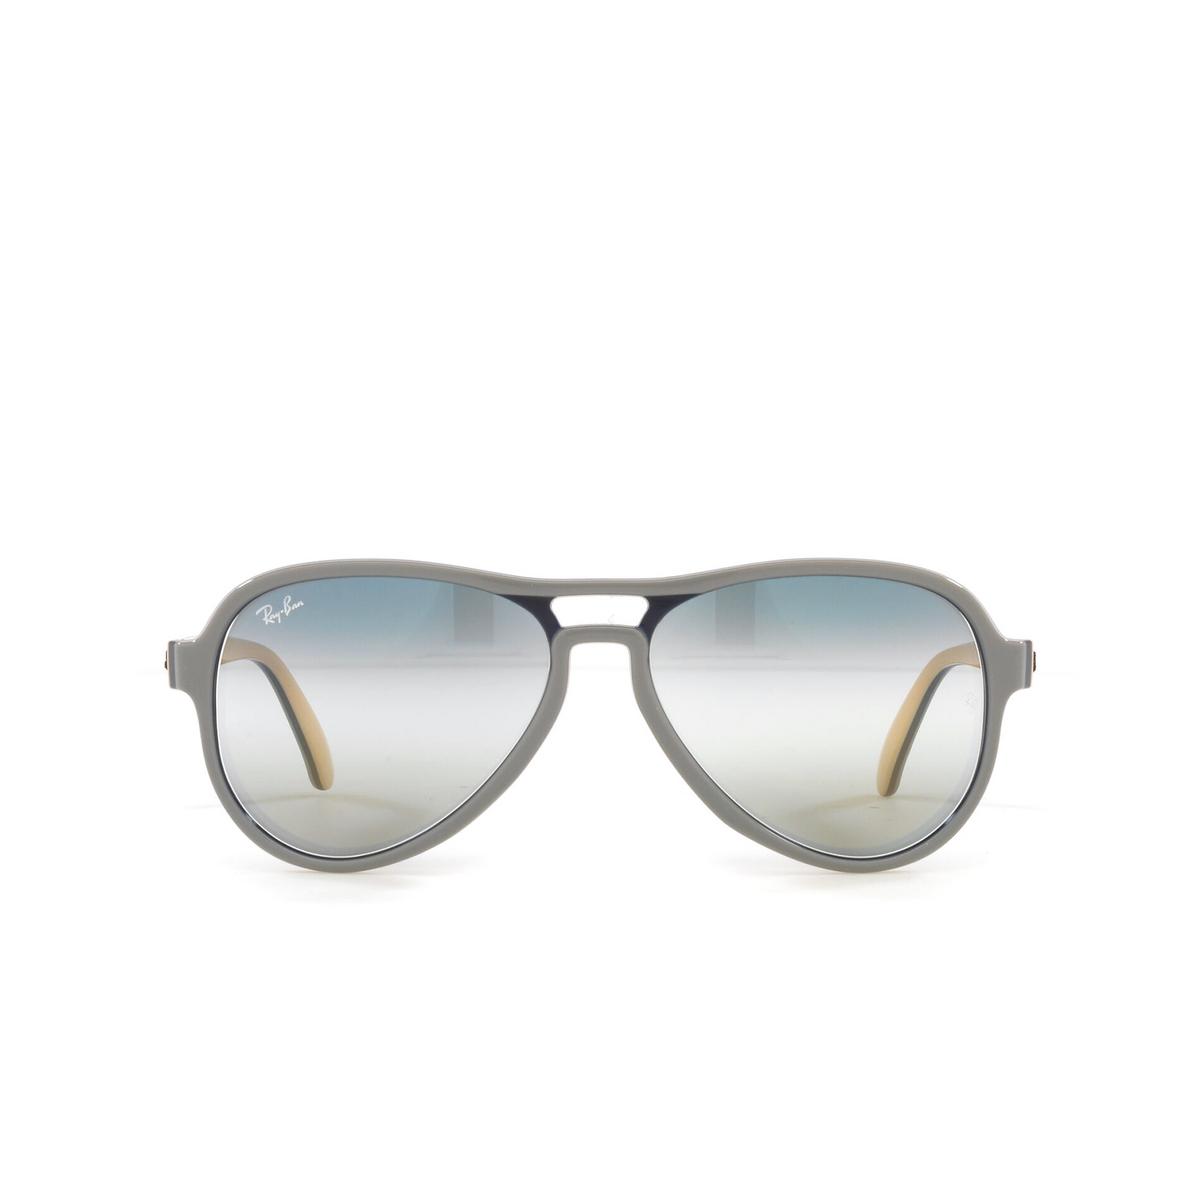 Ray-Ban® Aviator Sunglasses: Vagabond RB4355 color Light Grey Blue Light Brown 6550GF - front view.